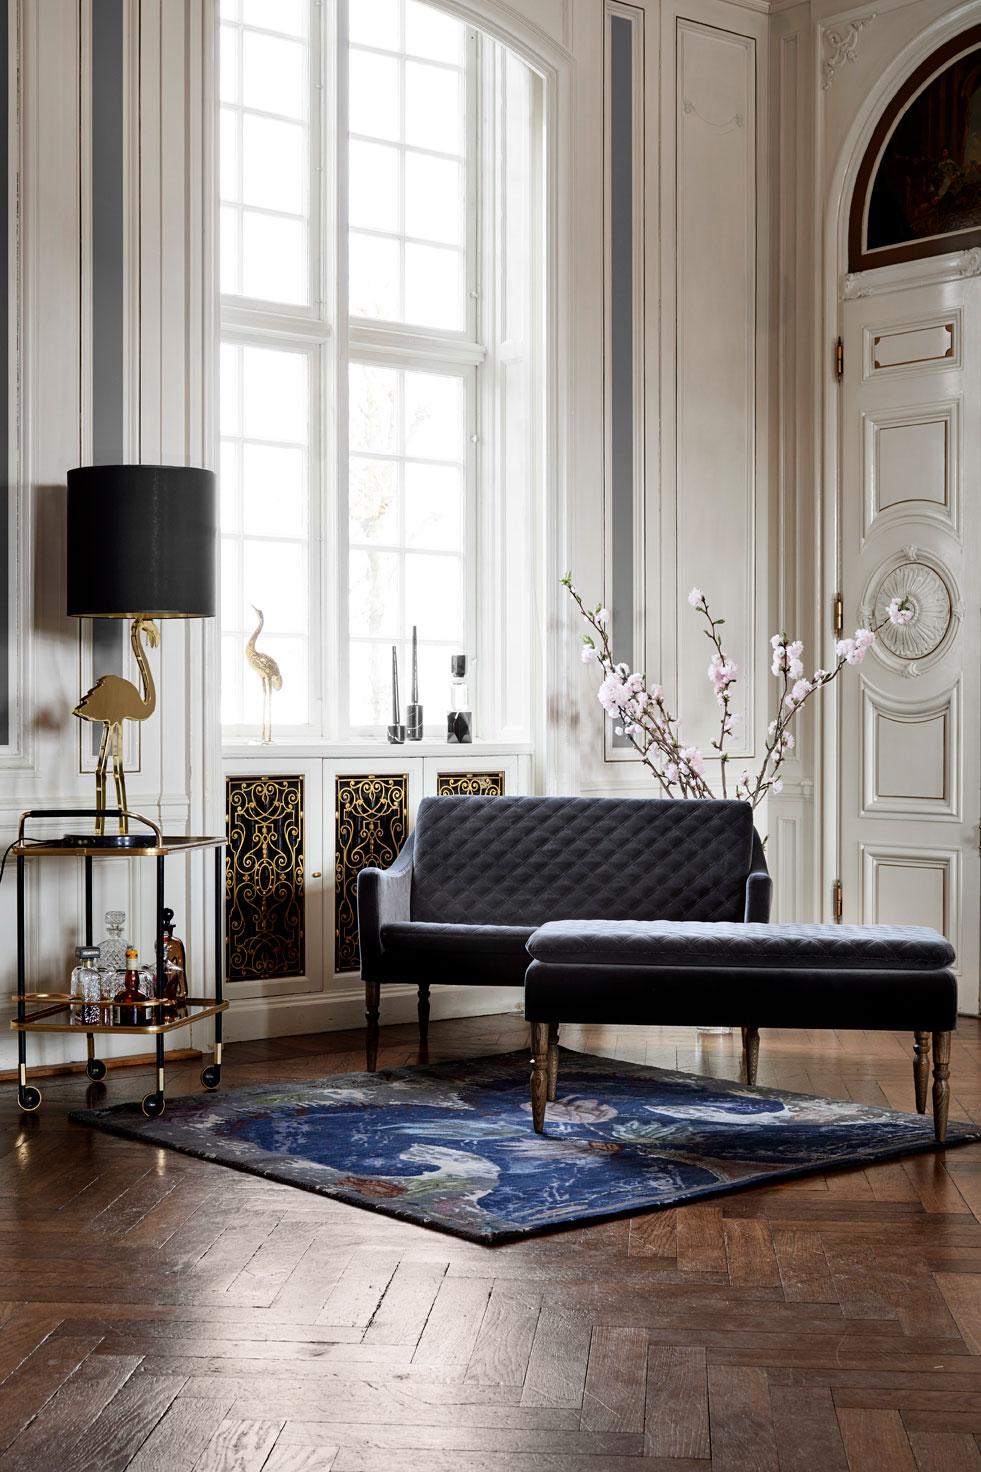 Design-by-us-17.03.27-Location-billeder-Sølyst2142.jpg